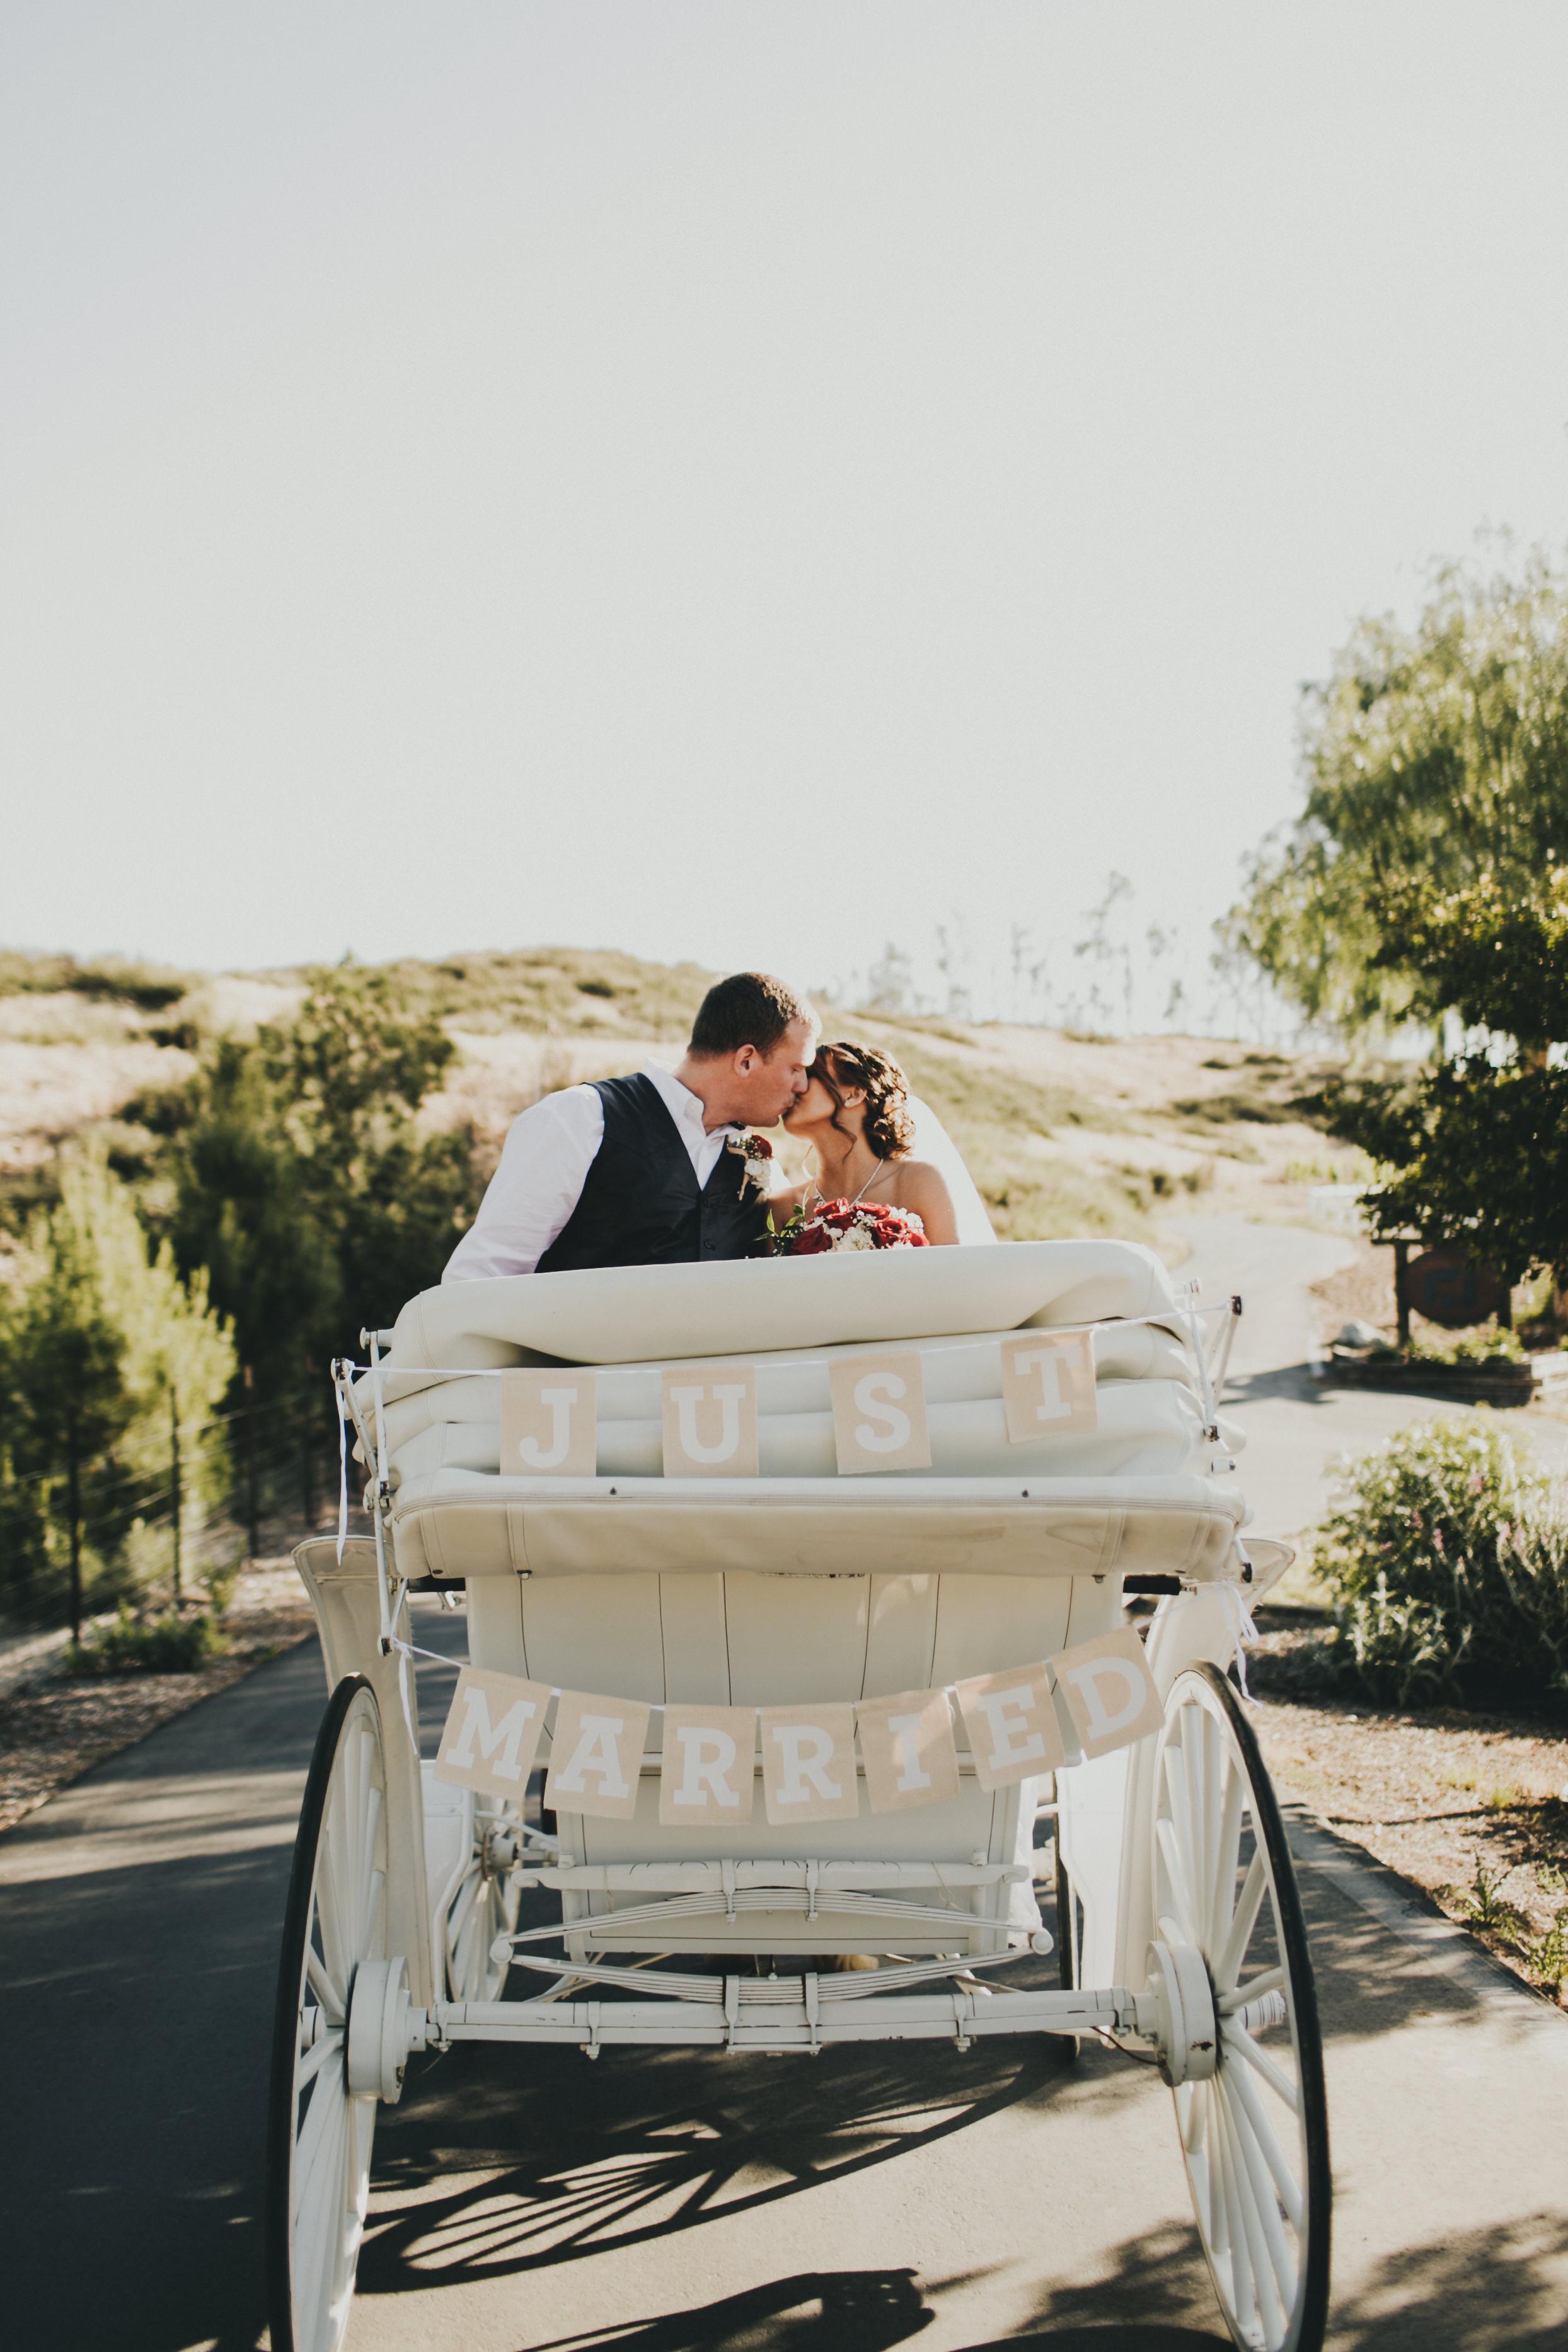 Cheyenne + Jordan - Wedding, Natalie Griffo (67 of 157).jpg